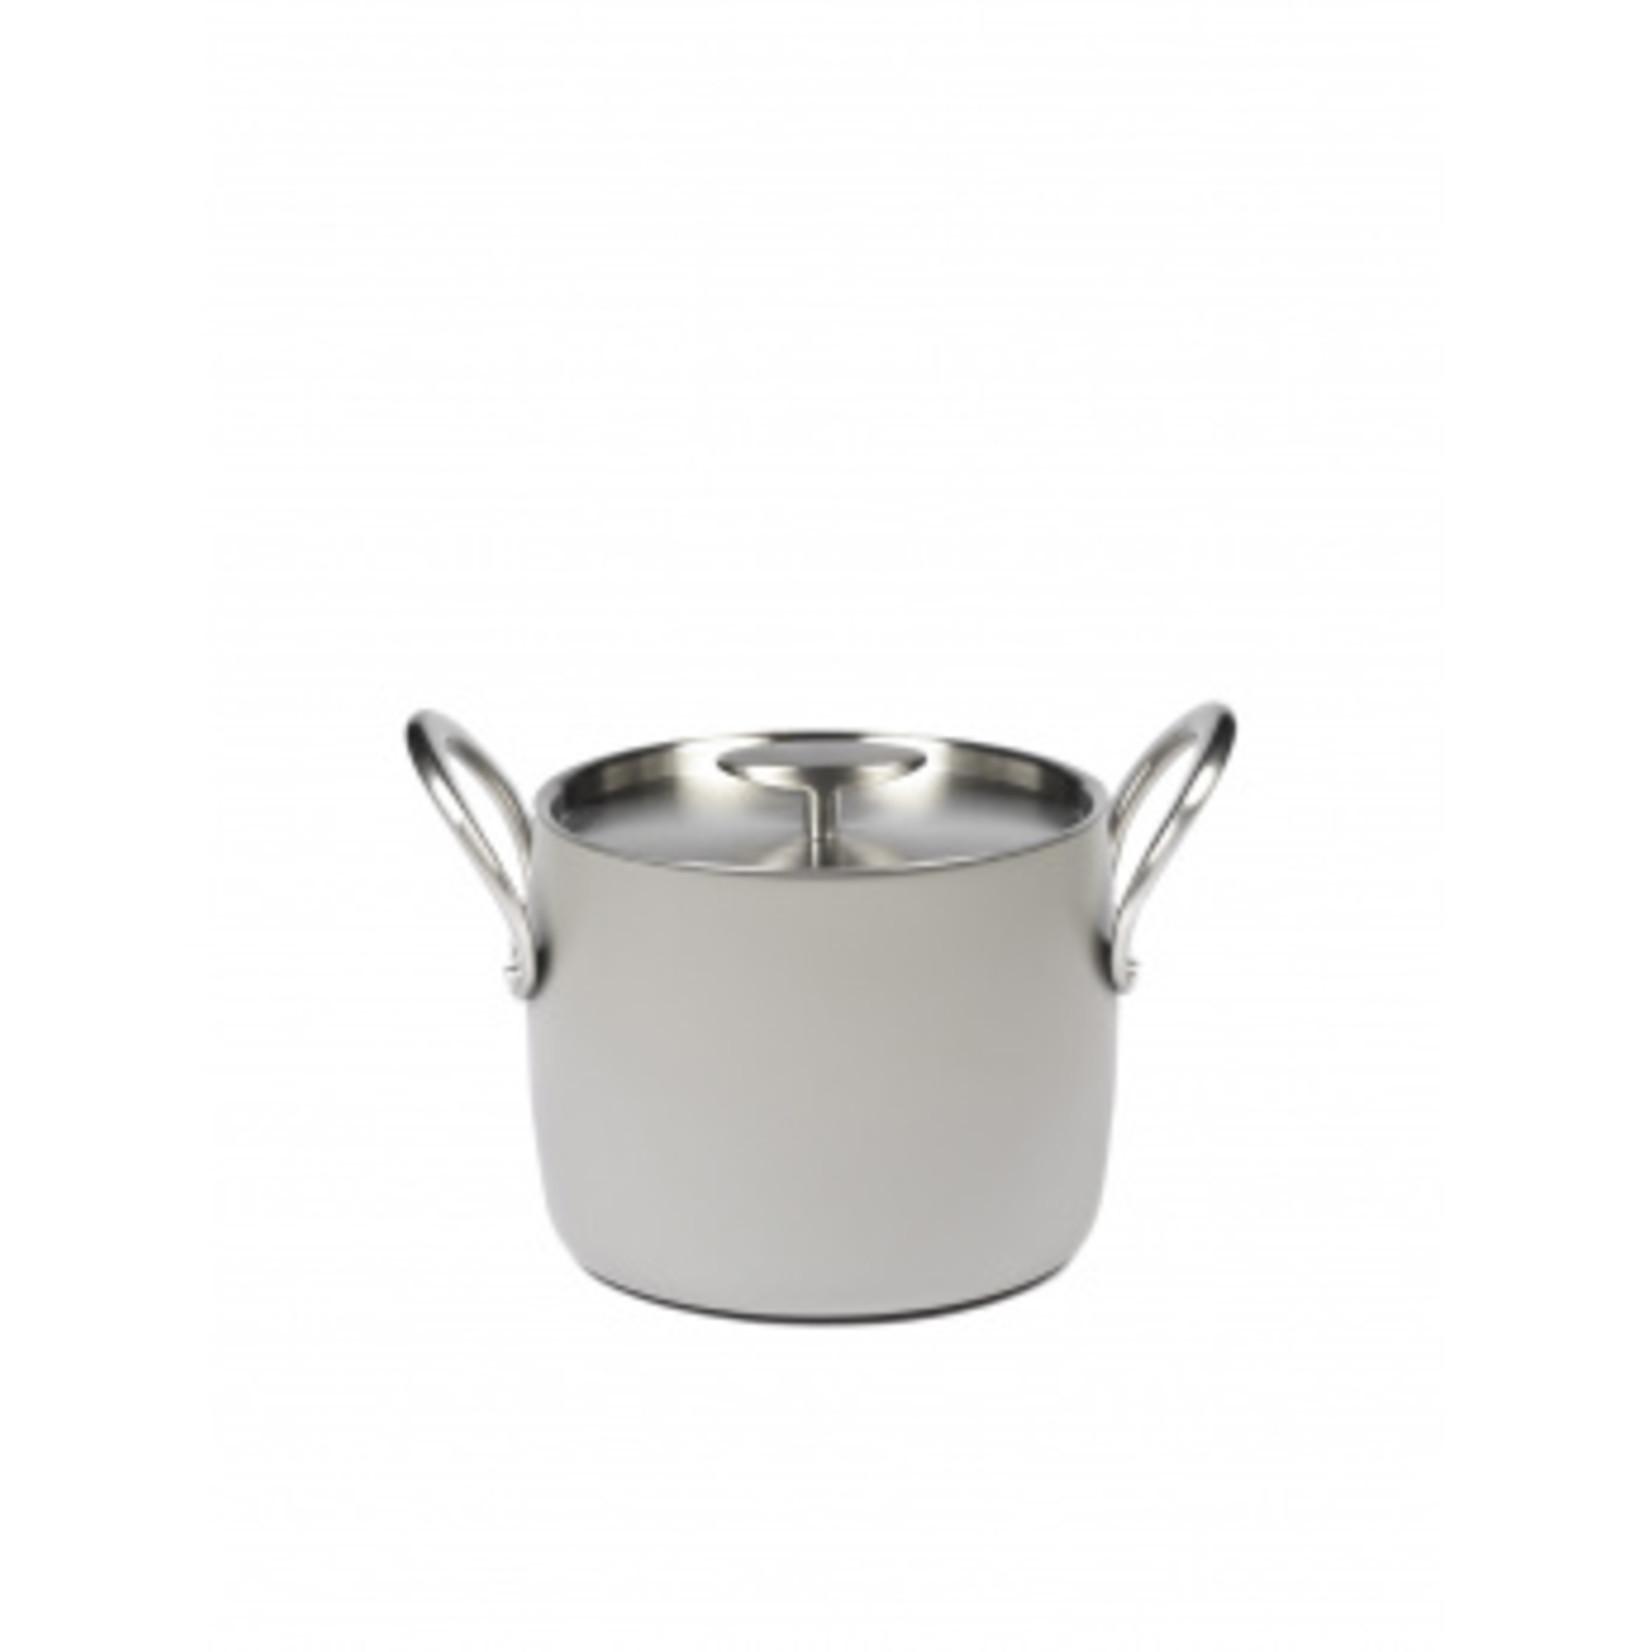 Pascale Naessens collection Pure Anti-kleef kookpot Aluminium 4 l